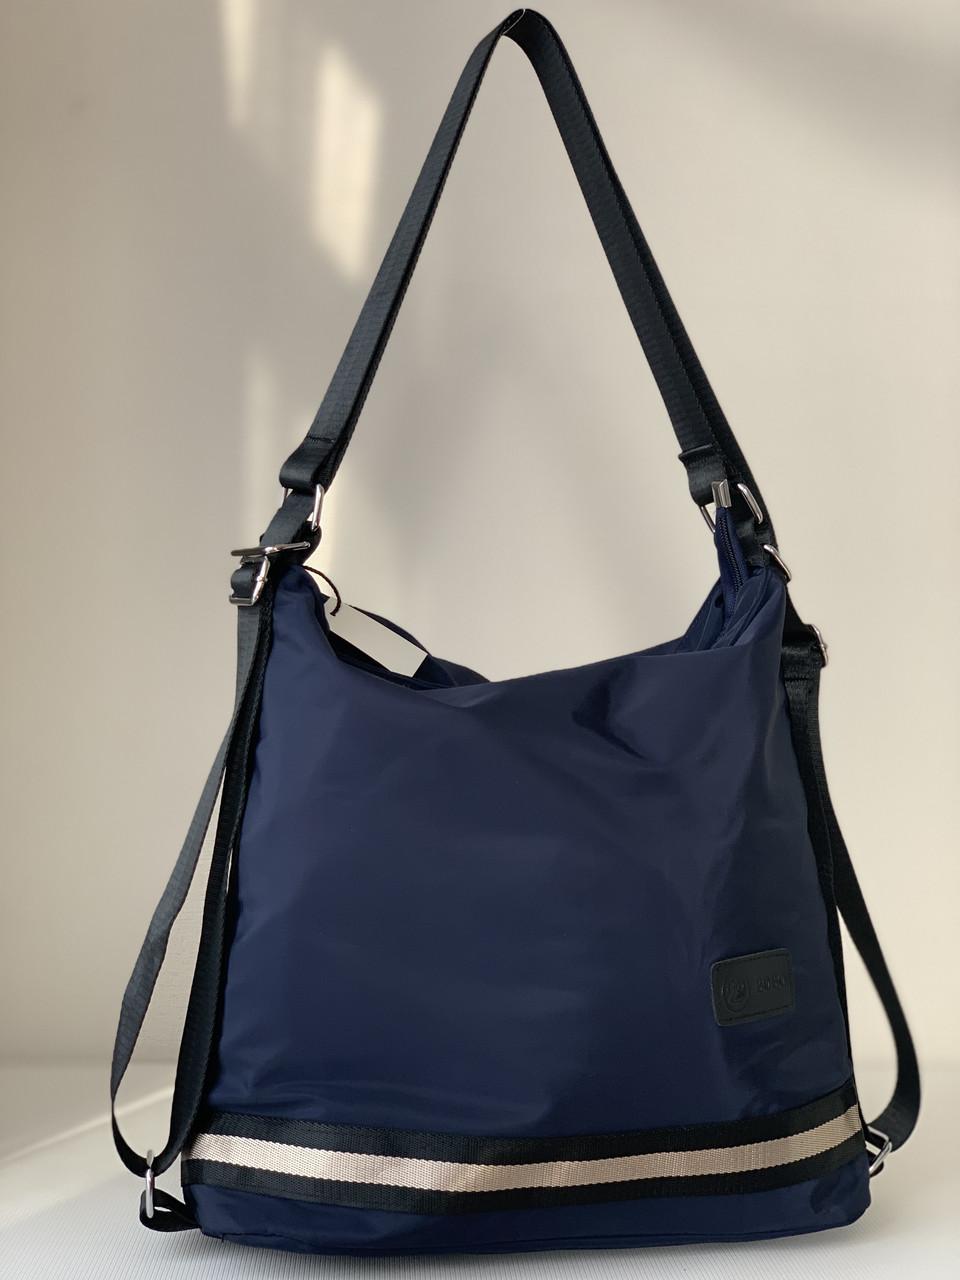 Сумка рюкзак спортивная нейлоновая темно-синяя